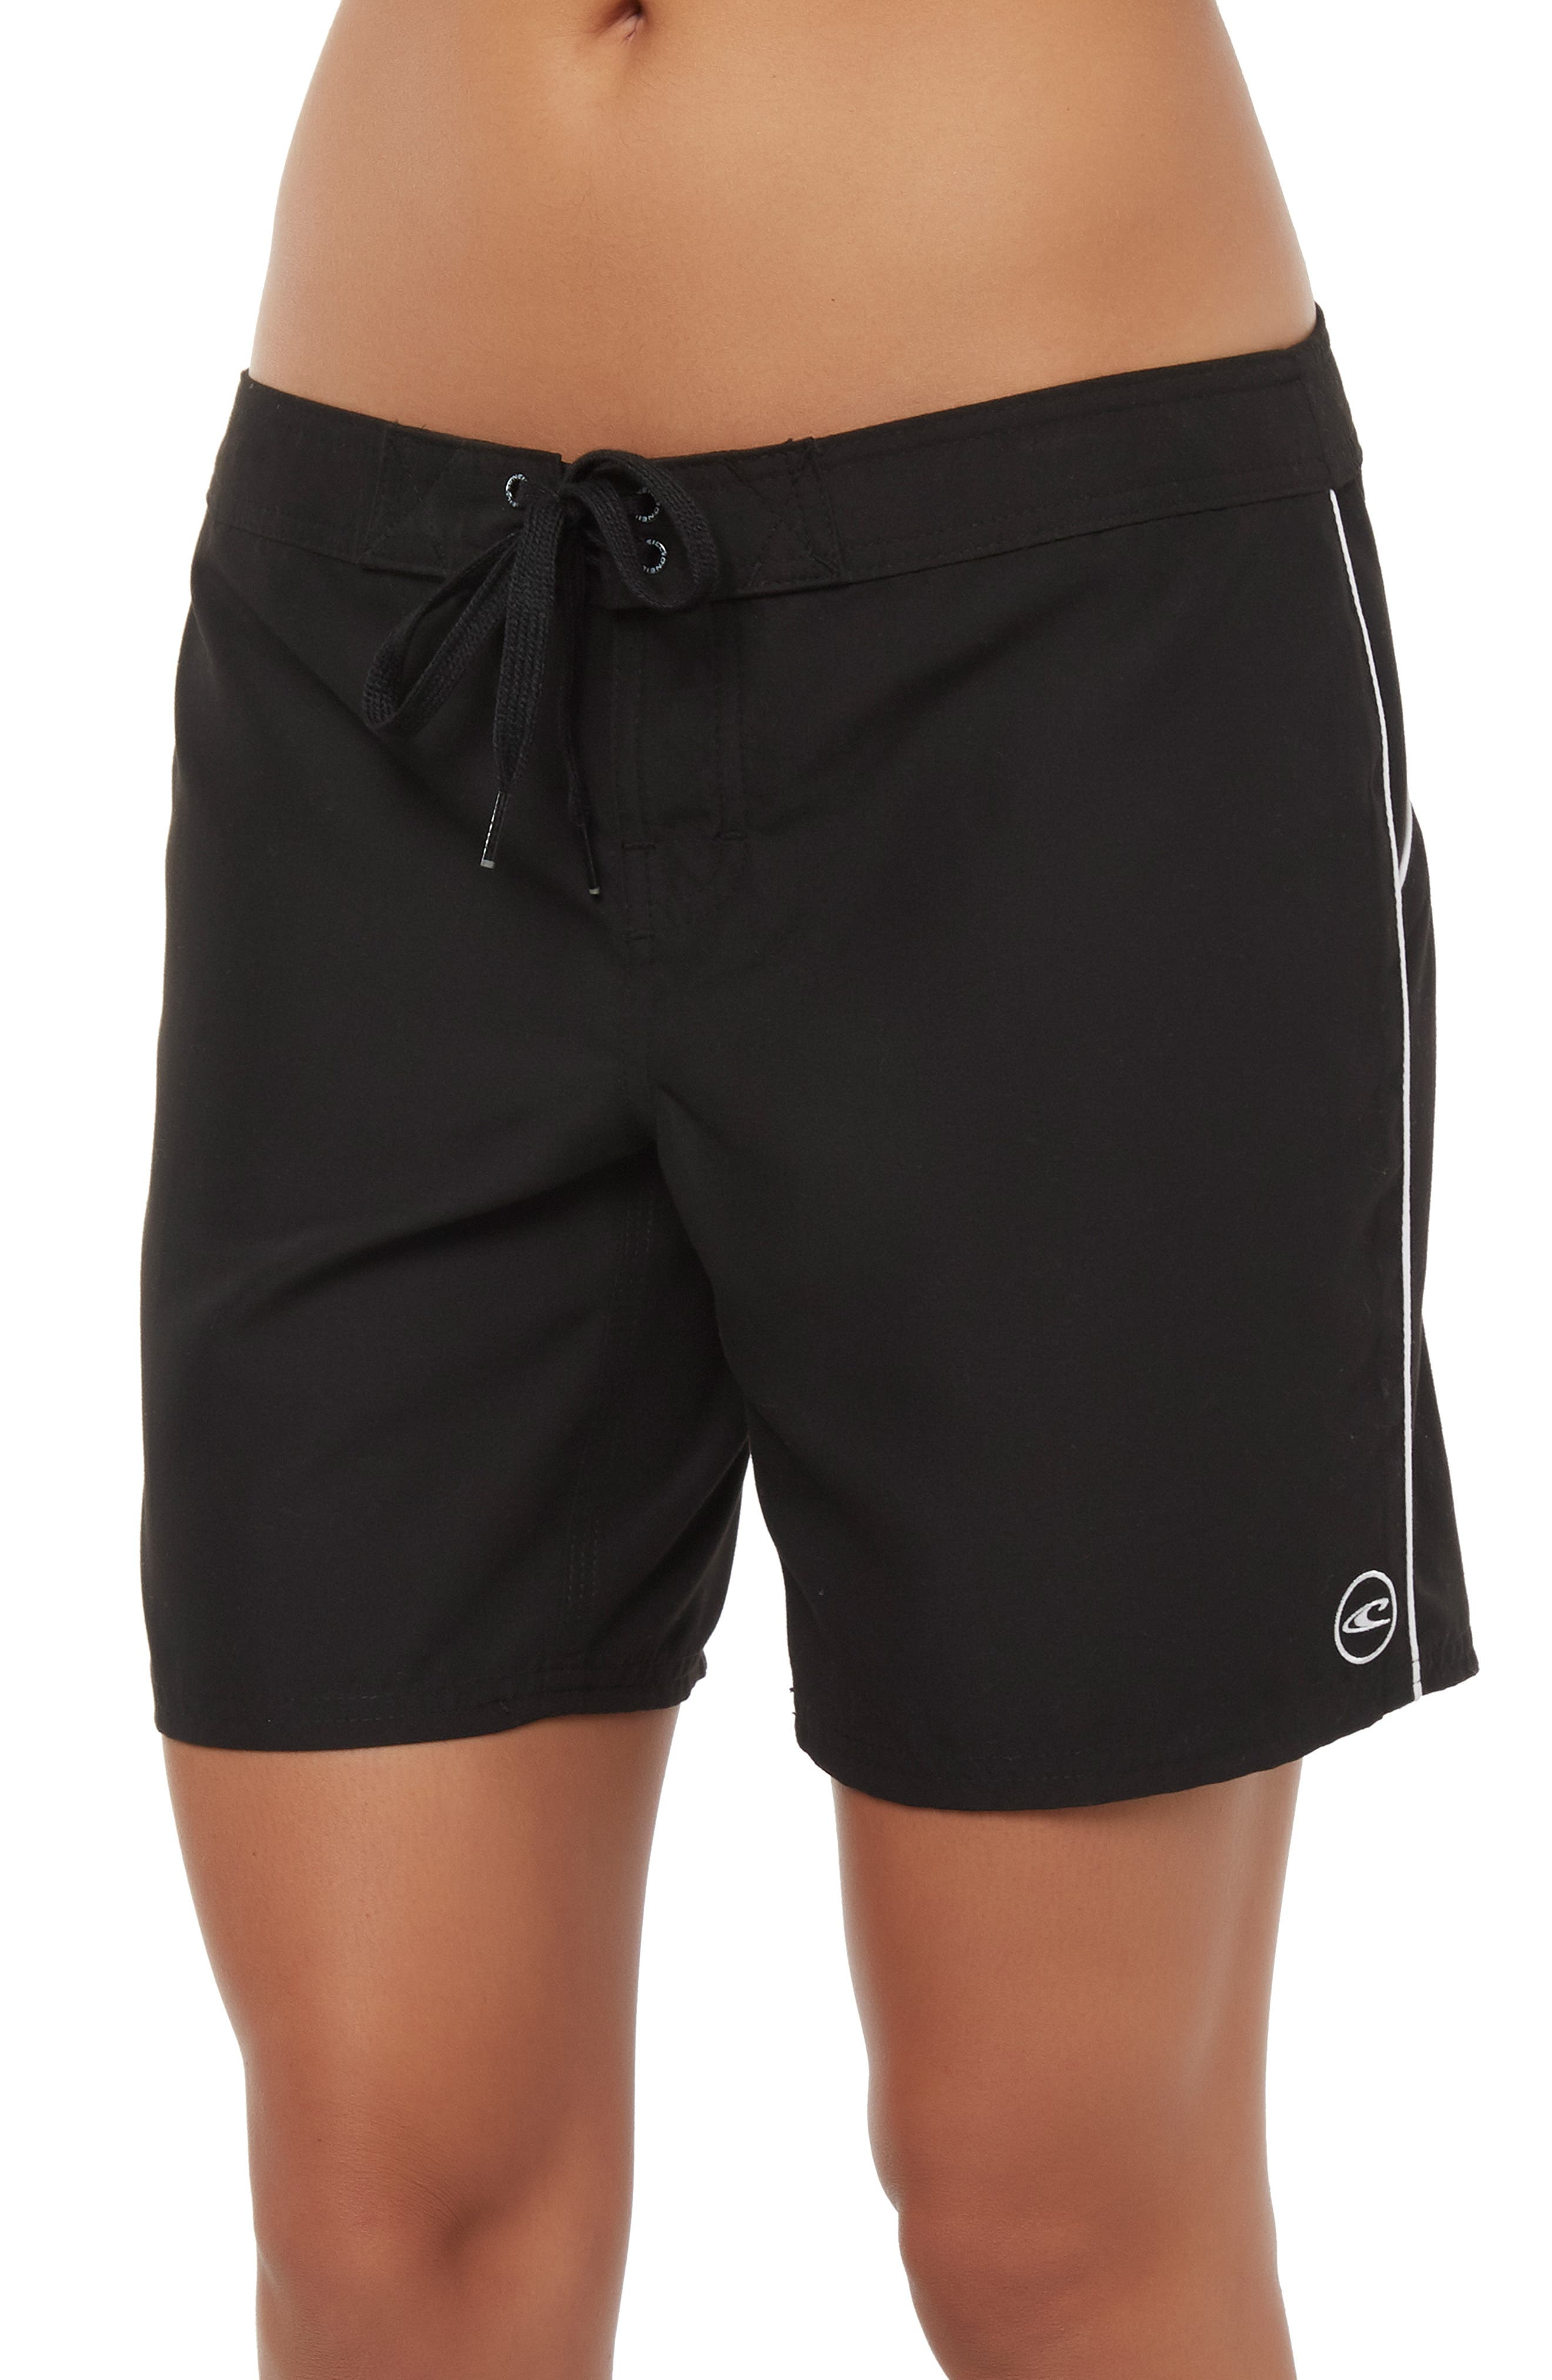 Salt Water Board Shorts,                             Alternate thumbnail 3, color,                             BLACK